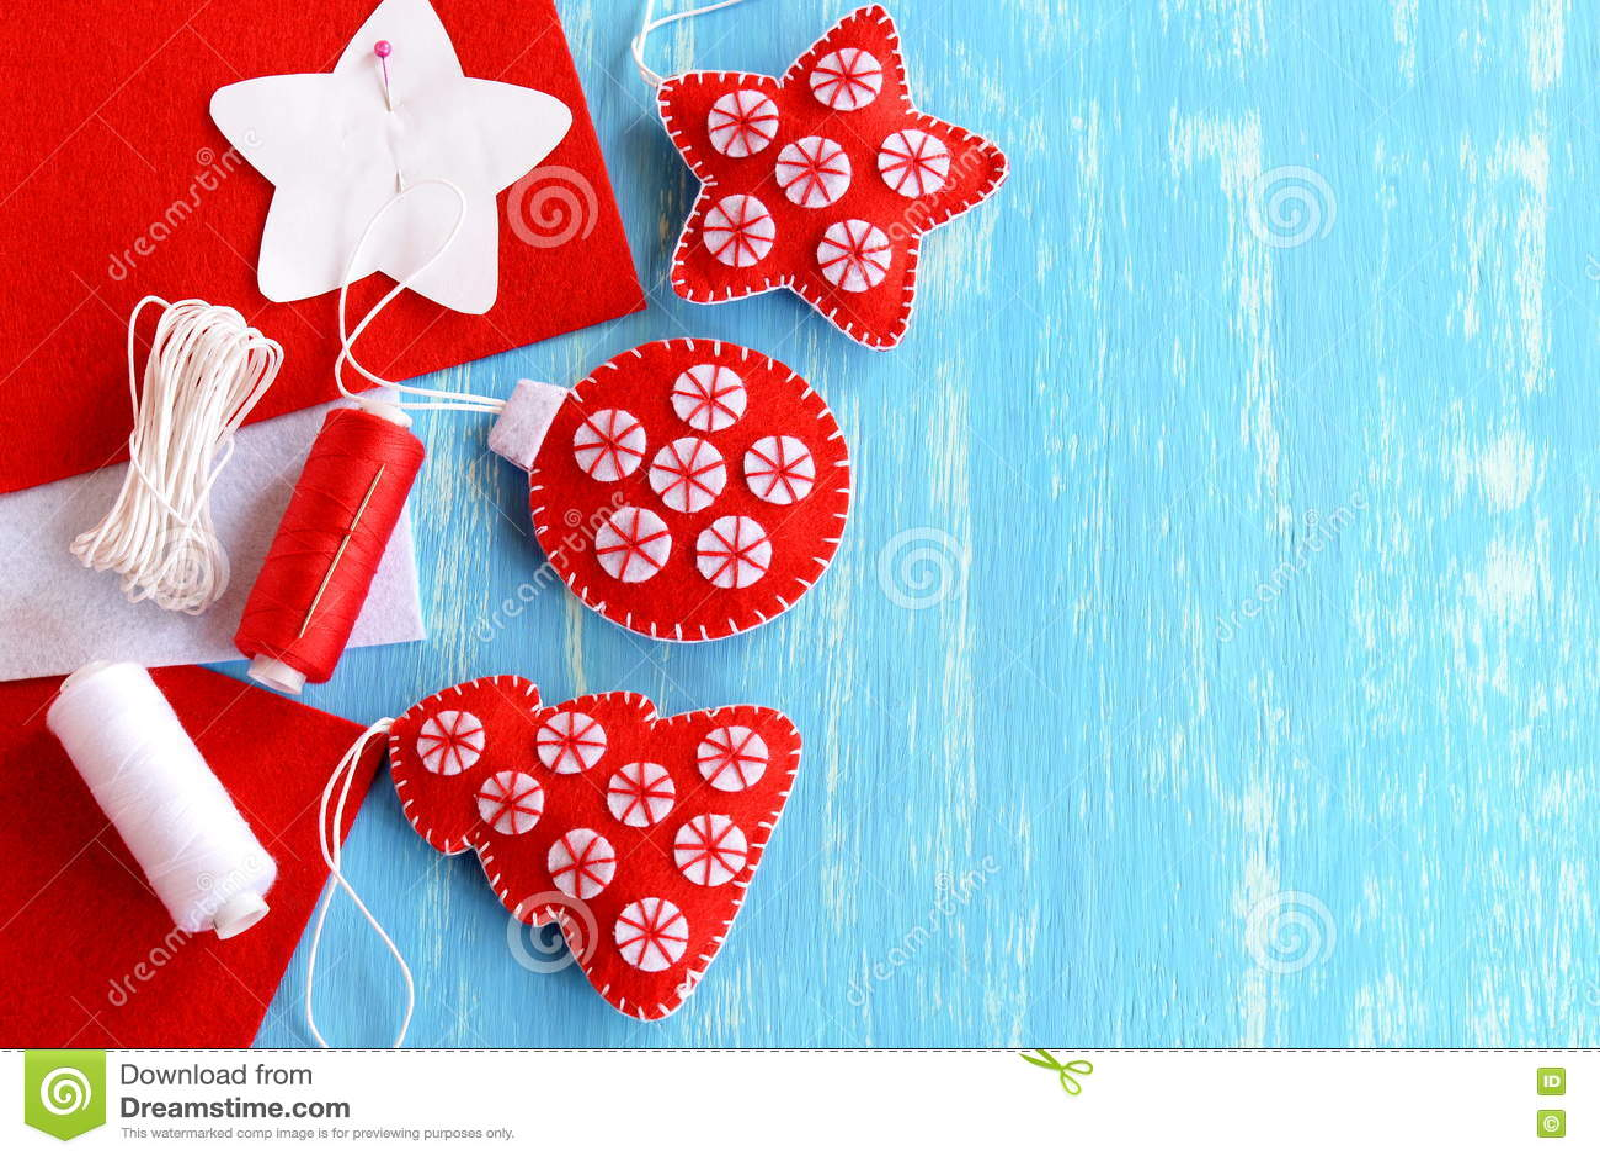 Home christmas ornaments - Home Christmas Ornaments Kids Holiday Crafts